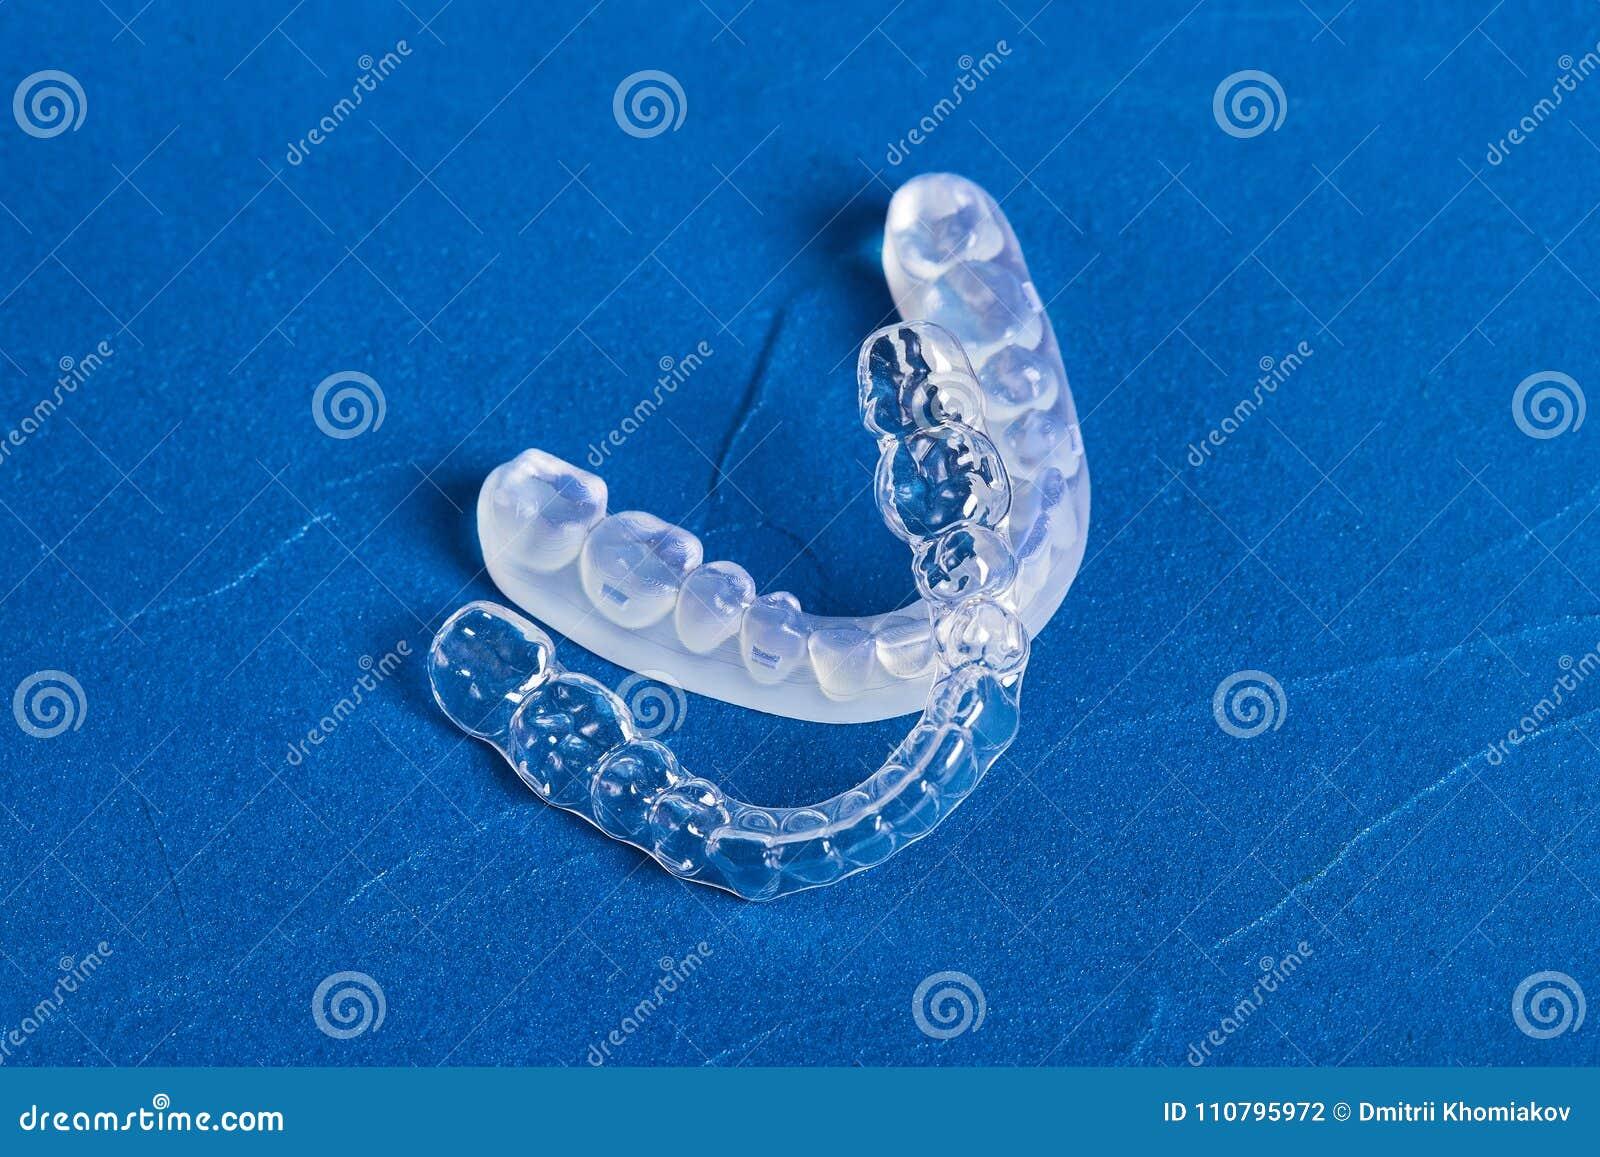 Pre-orthodontic dental trainer alignment appliance